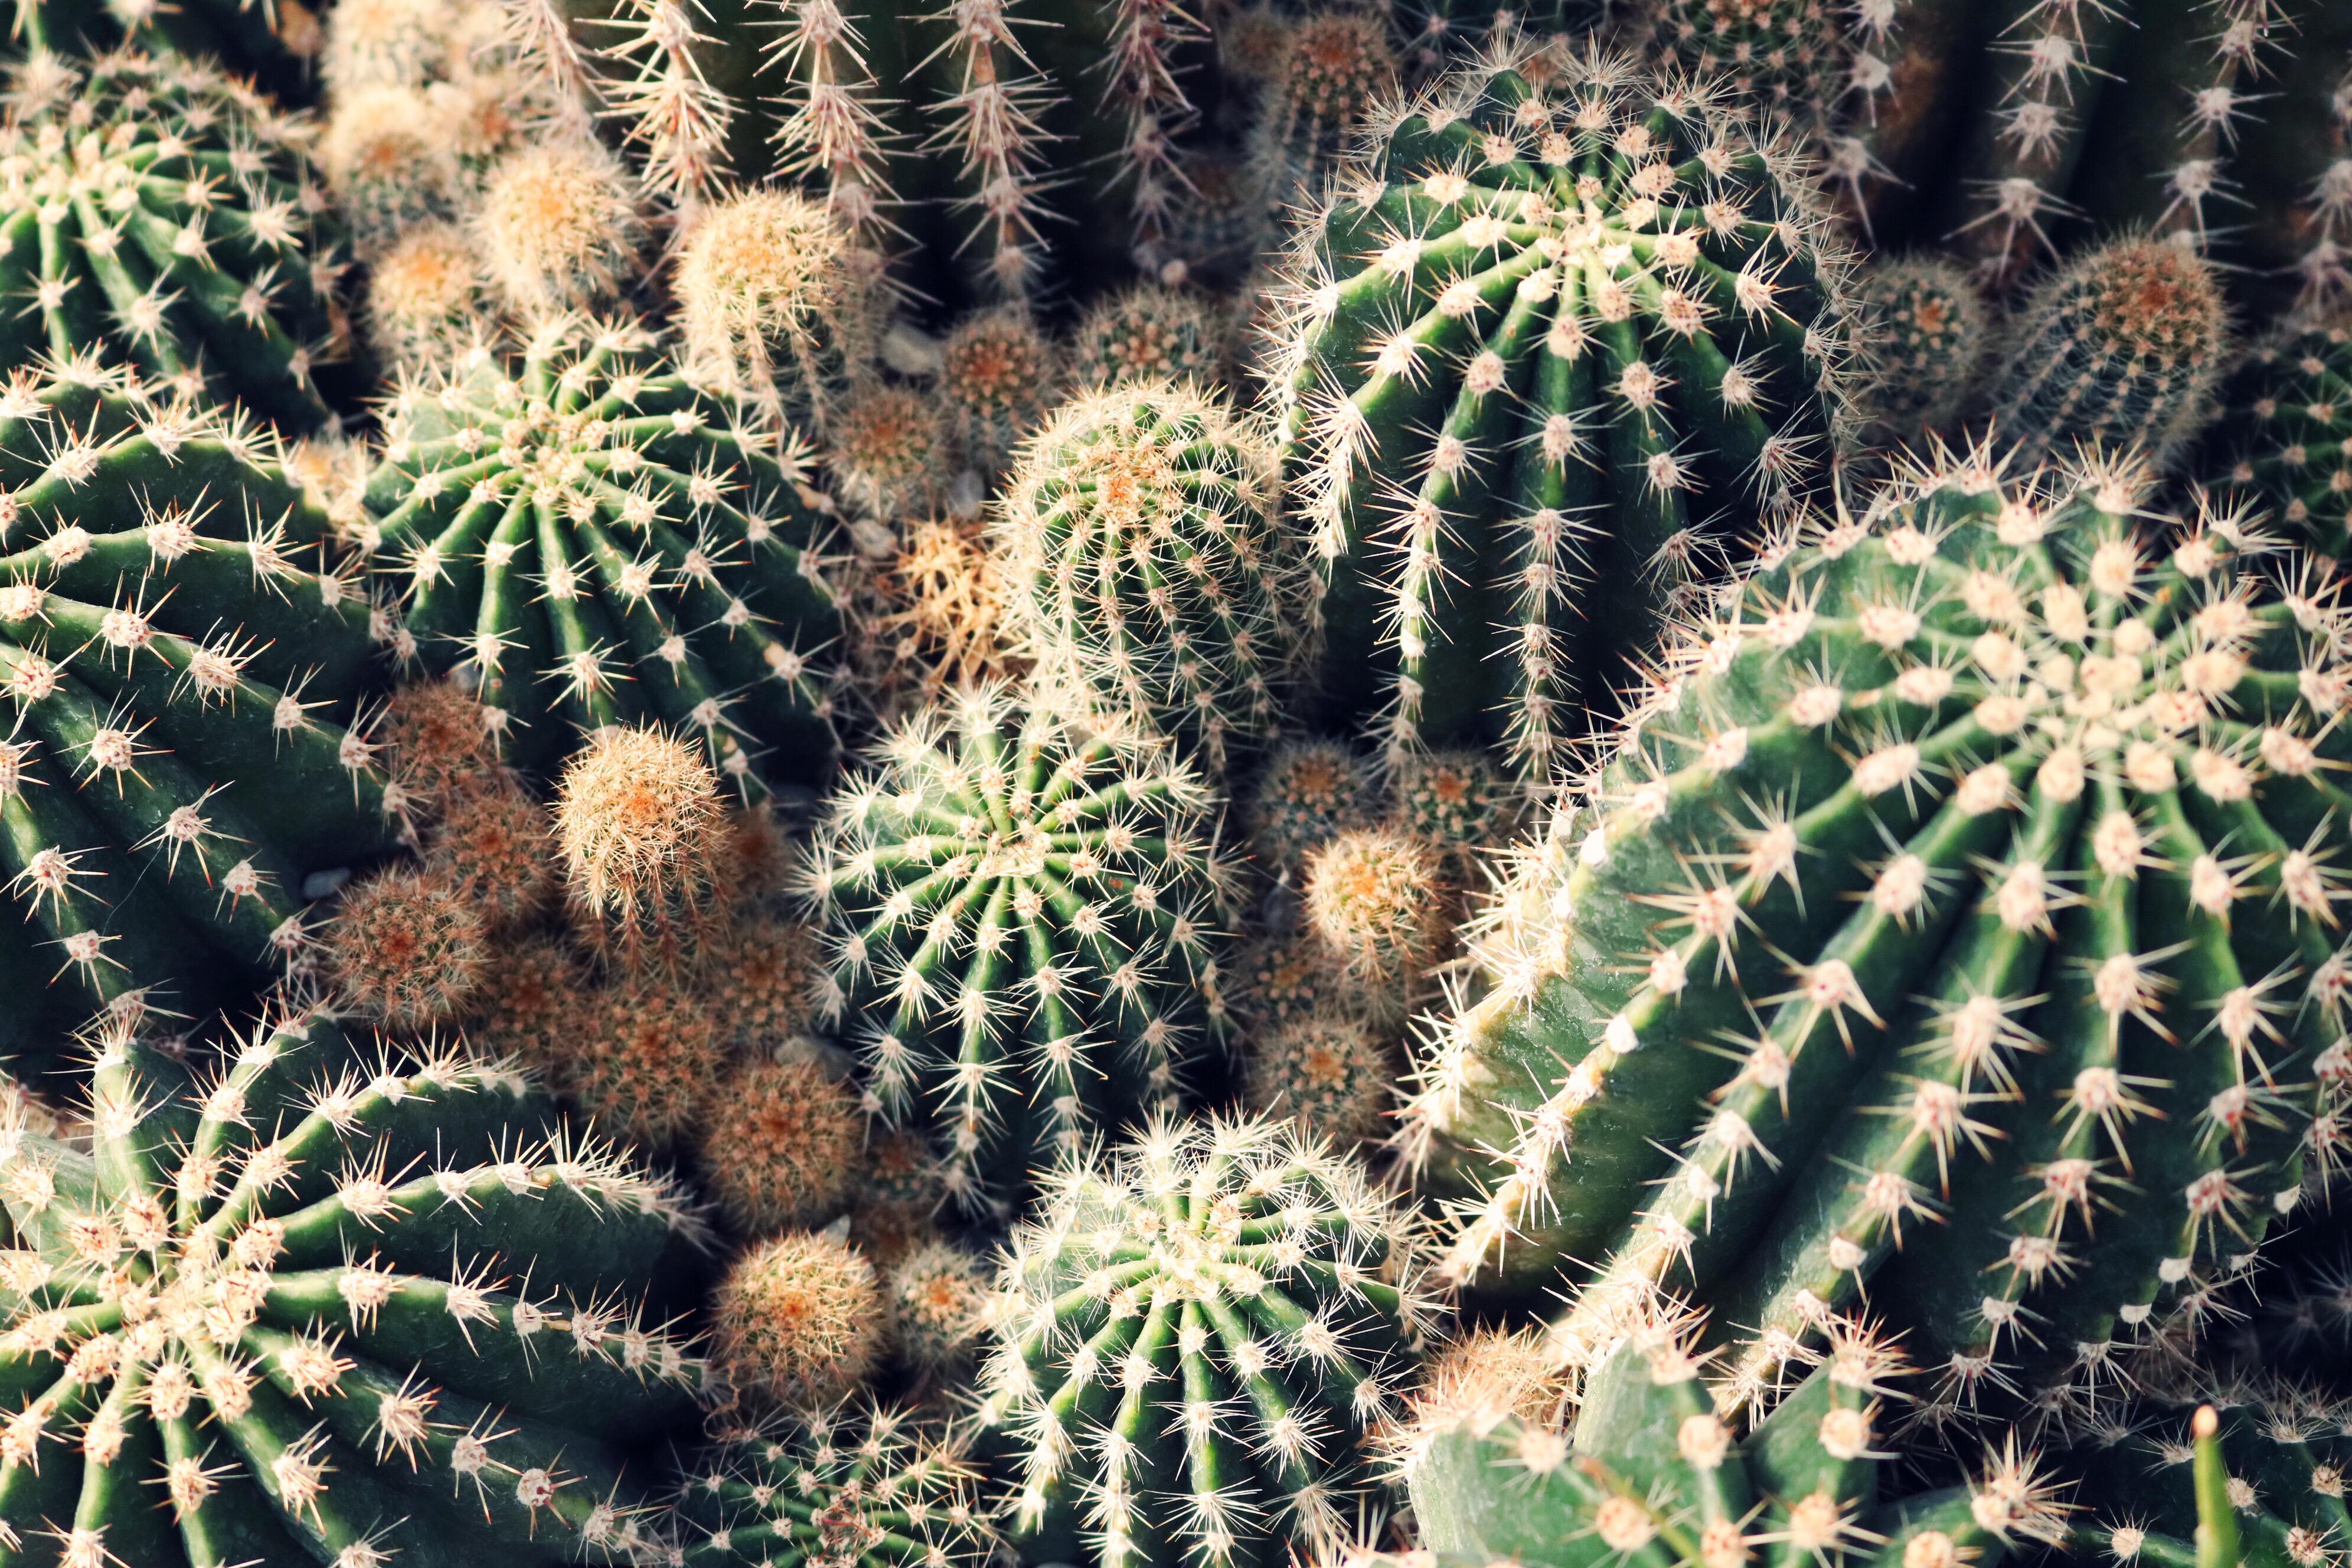 Desert Landscape Wallpaper Hd Cactus Plants Under The Starry Sky 183 Free Stock Photo